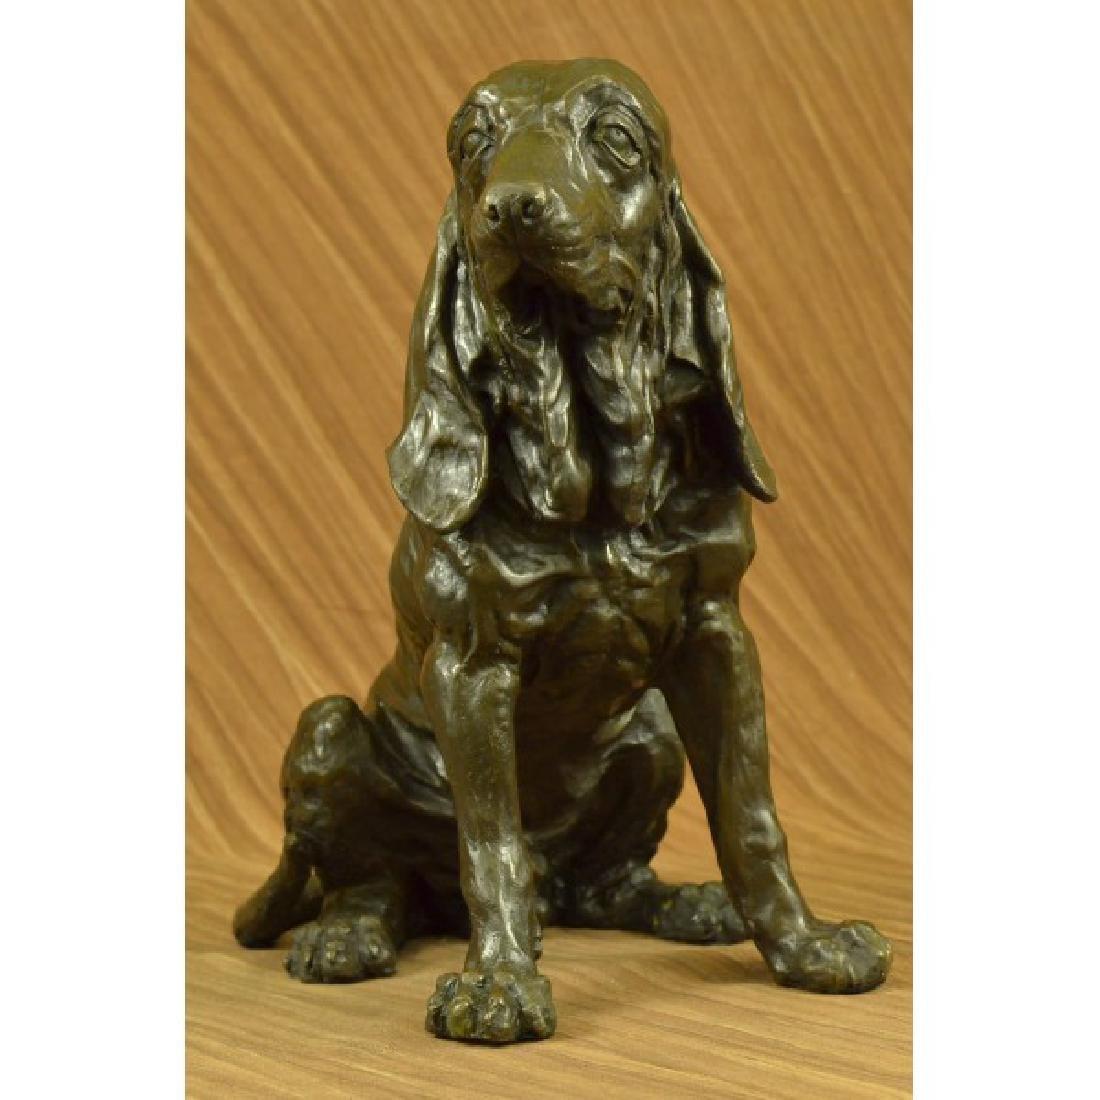 Hound Dog Garden Backyard Decor Bronze Sculpture Statue